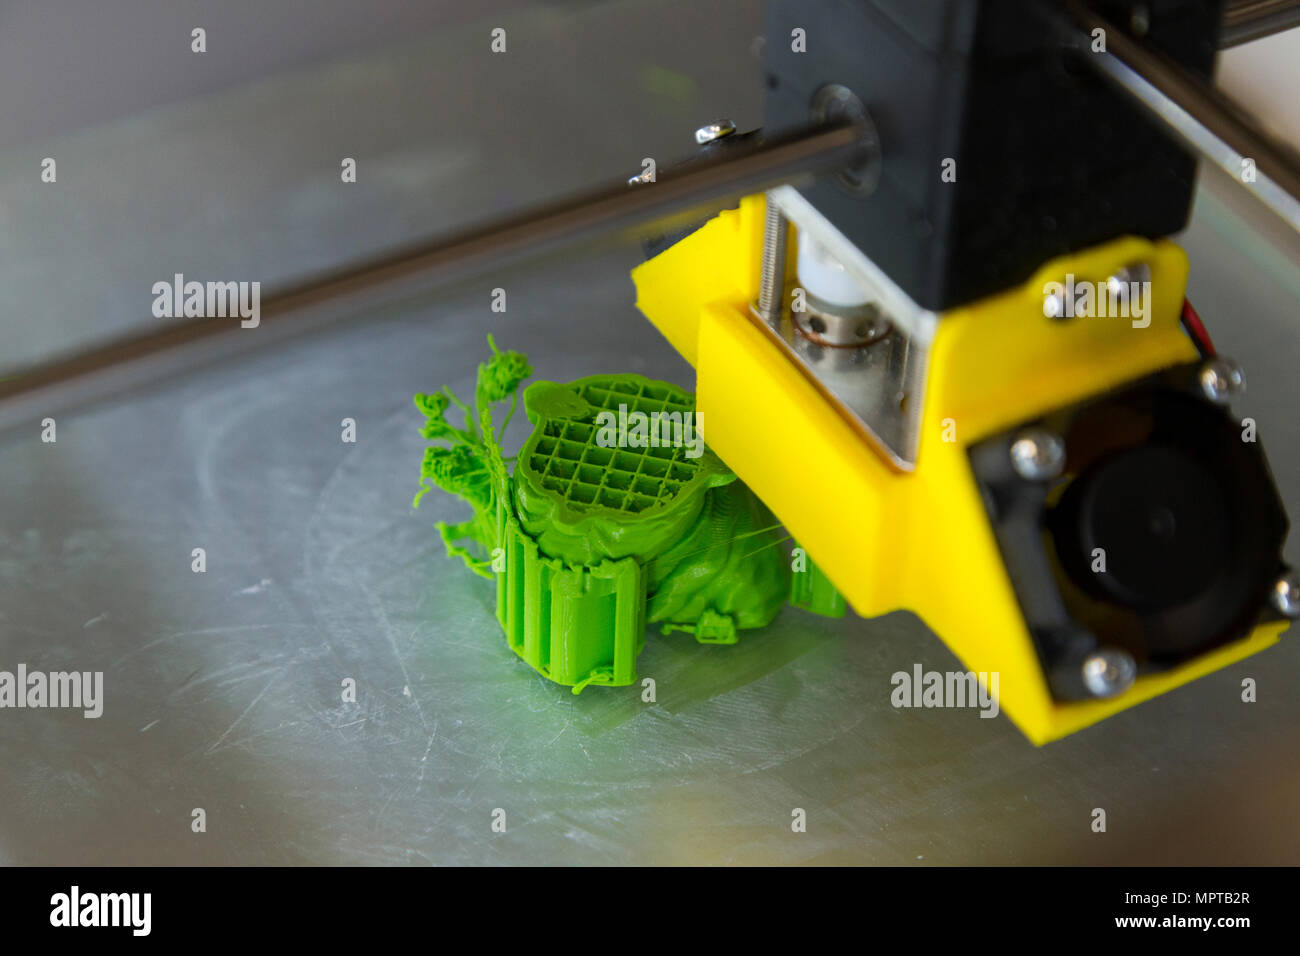 3D / three dimensional printing equipment display; Open Day at the National Physical Laboratory (NPL), Teddington. London. UK. (97) - Stock Image